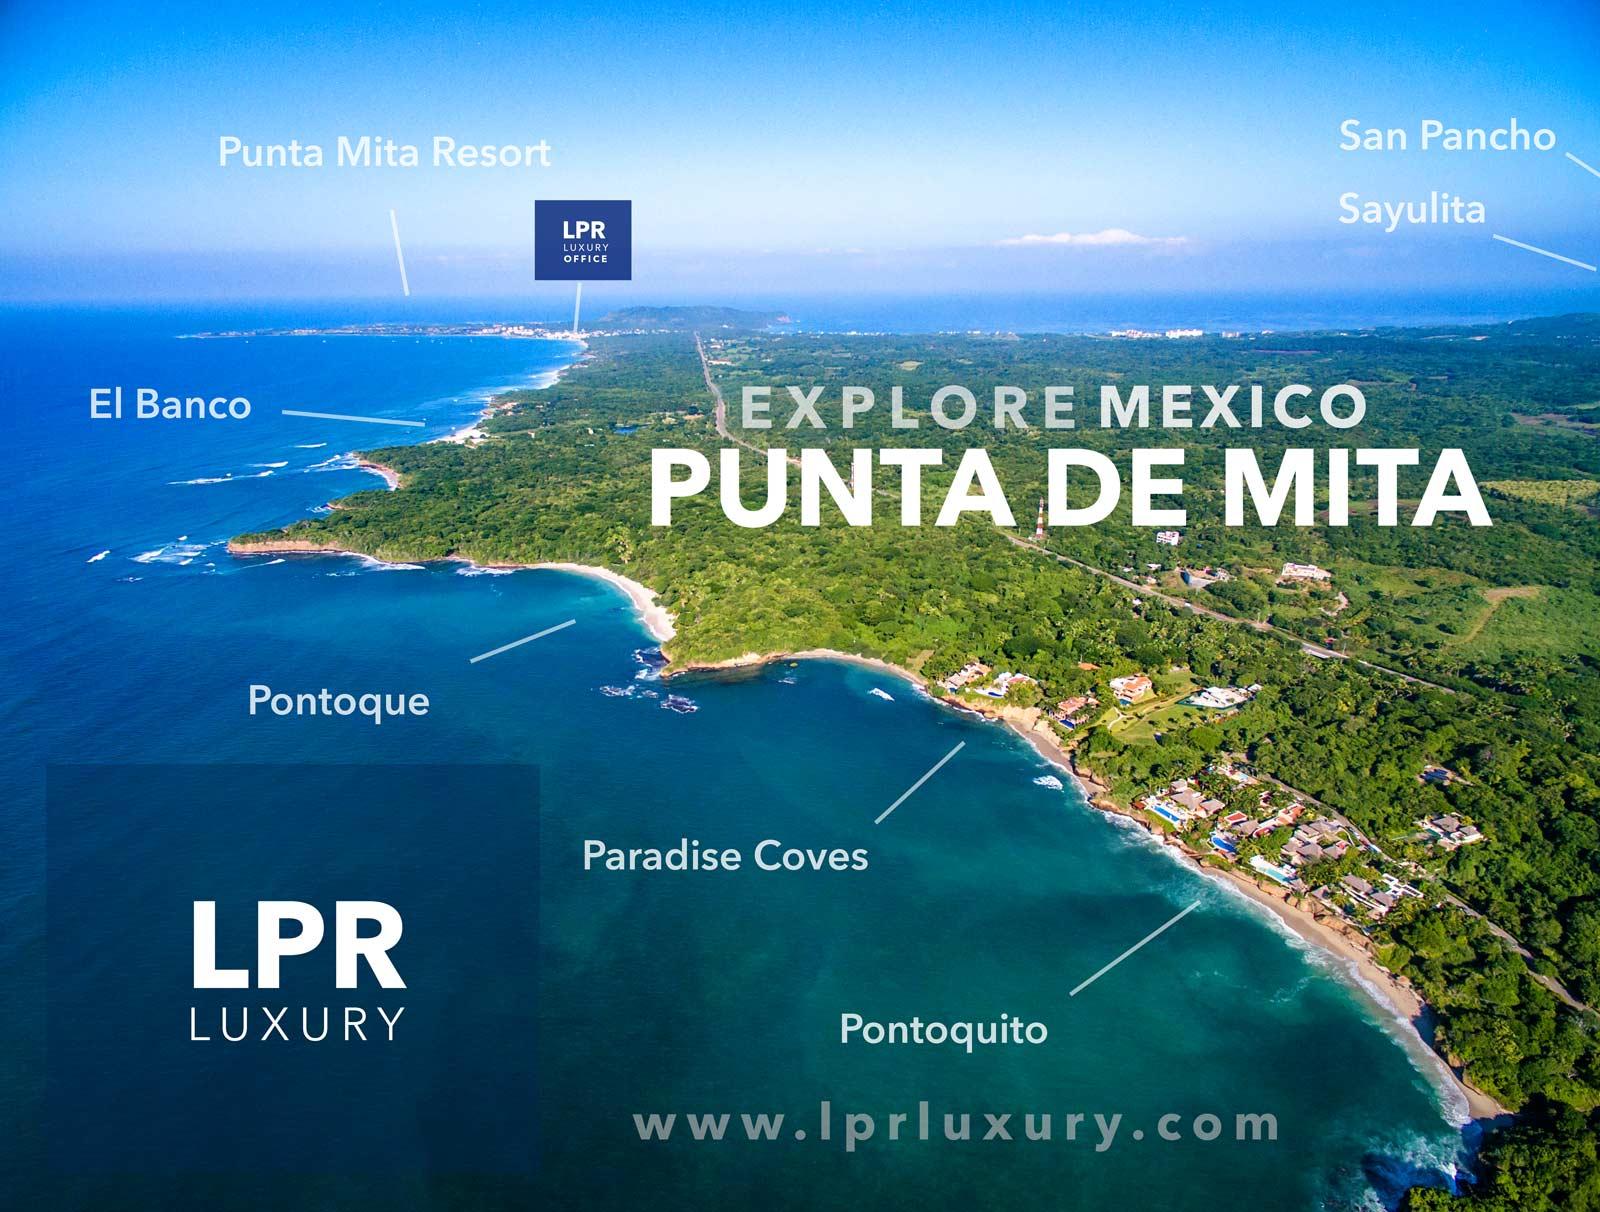 Explore the Punta de Mita peninsula - Riviera Nayarit, Mexico